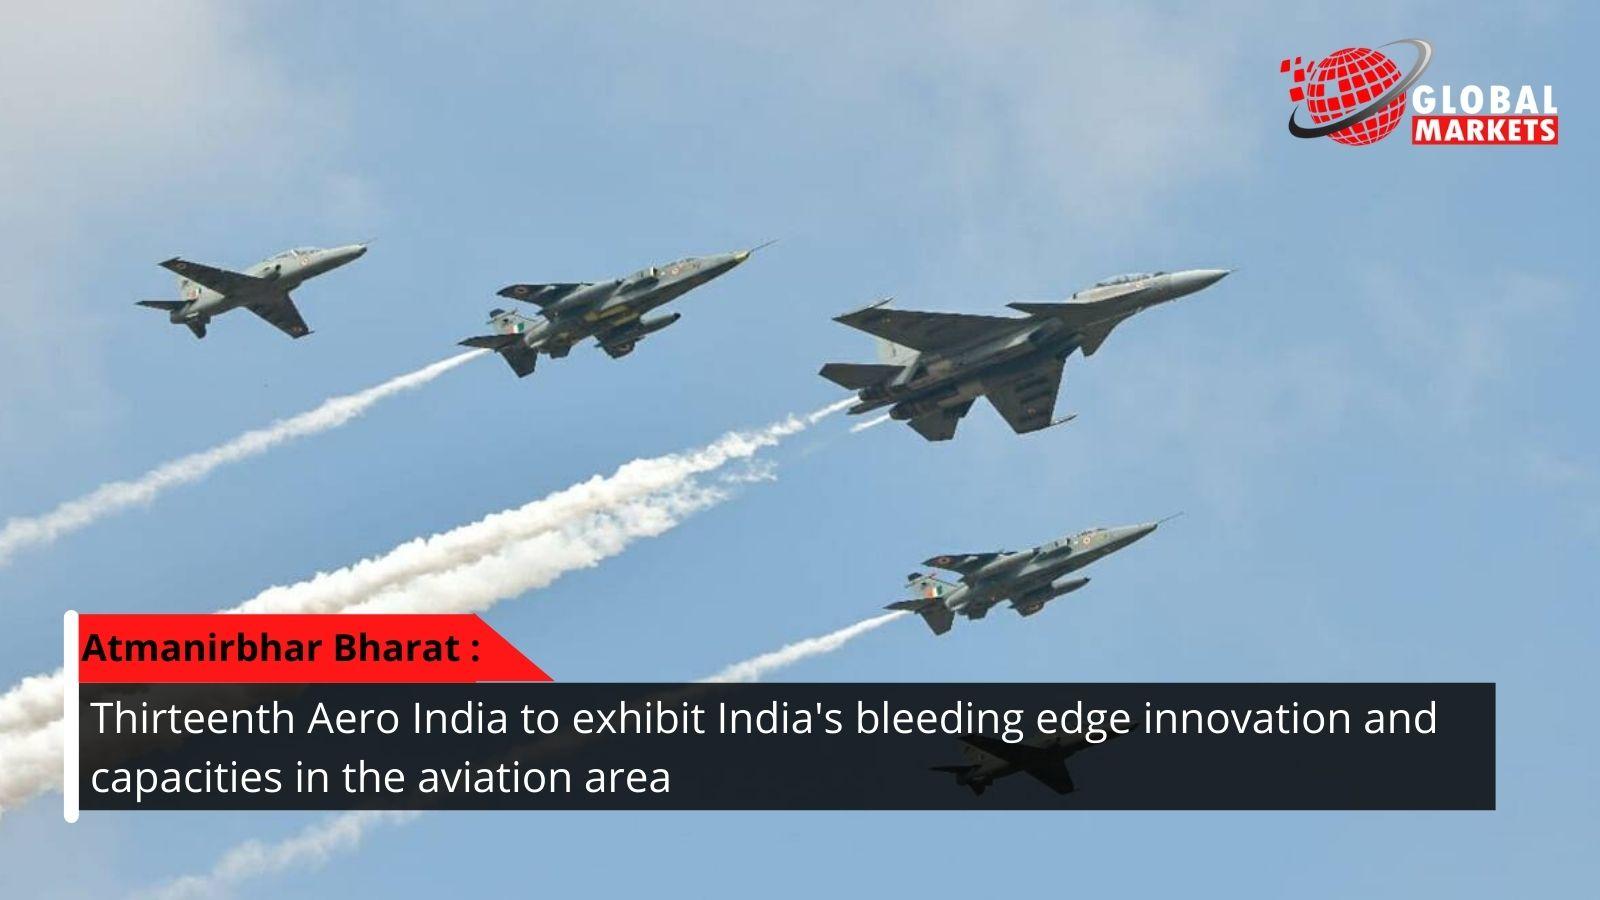 Atmanirbhar Bharat: thirteenth Aero India to exhibit India's bleeding edge innovation .